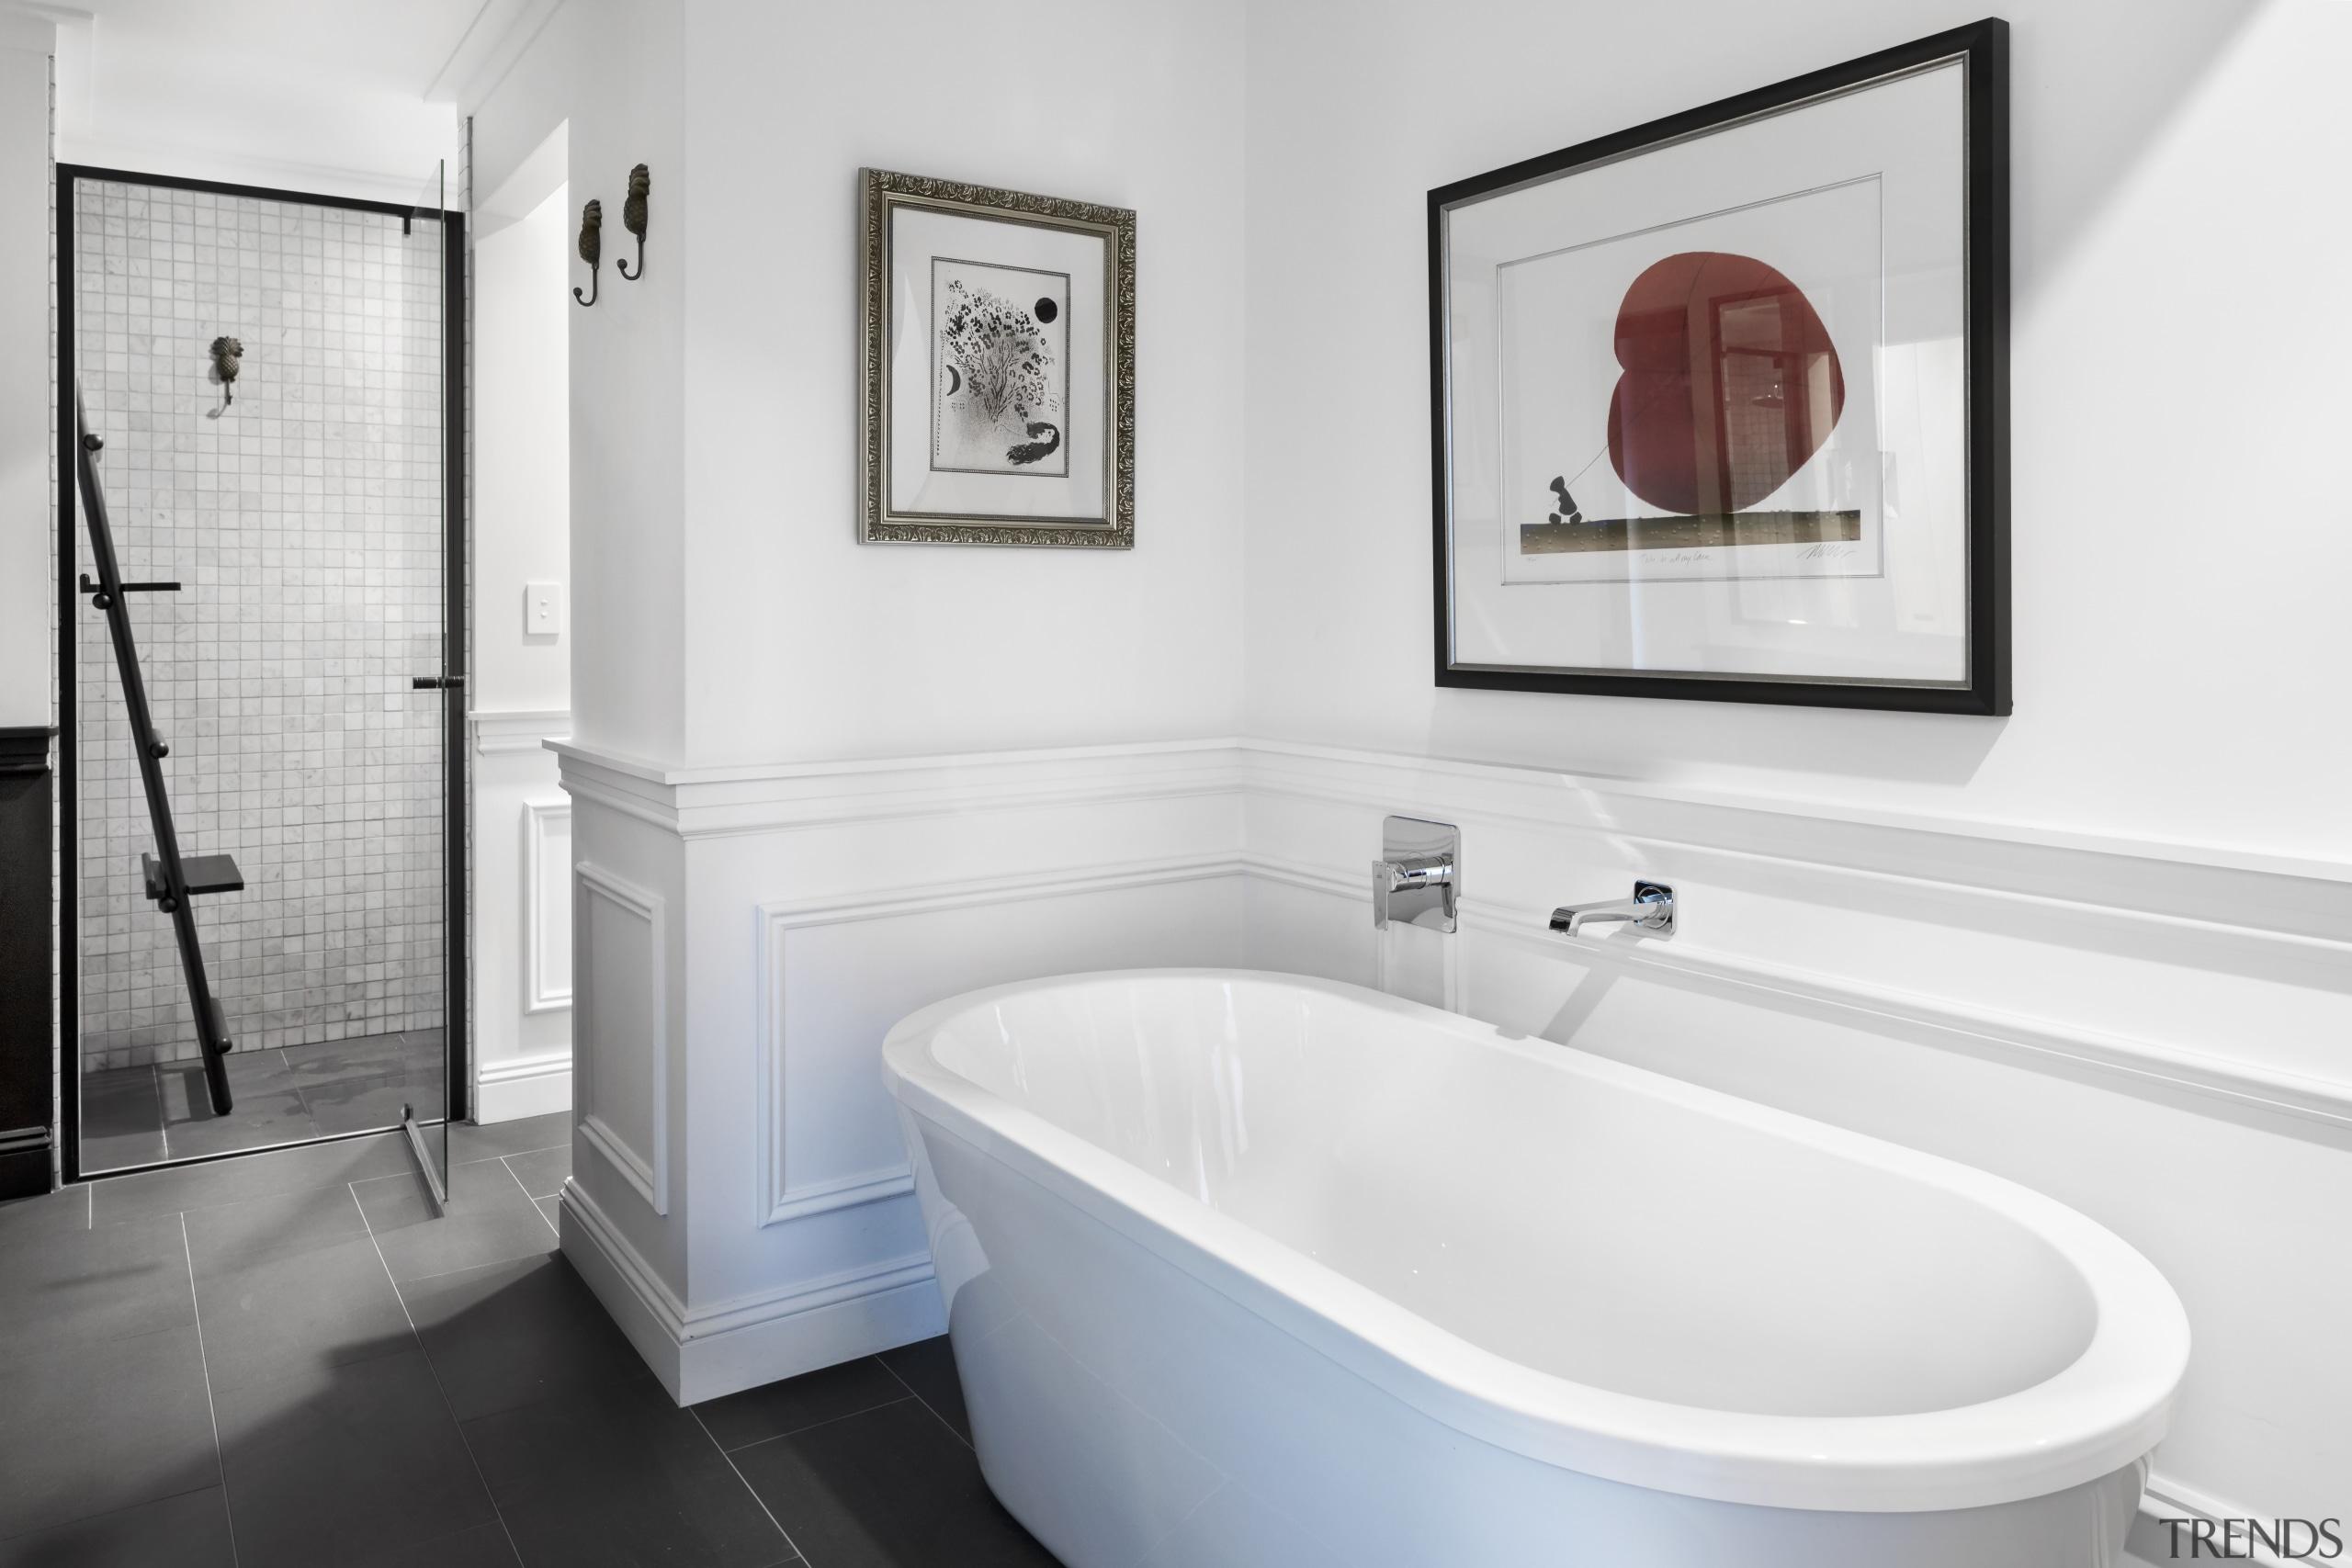 Even the artwork over the freestanding tub gets bathroom, bathroom accessories, tiled floor, bathroom design, plumbing fixtures, tap, white, Leon House